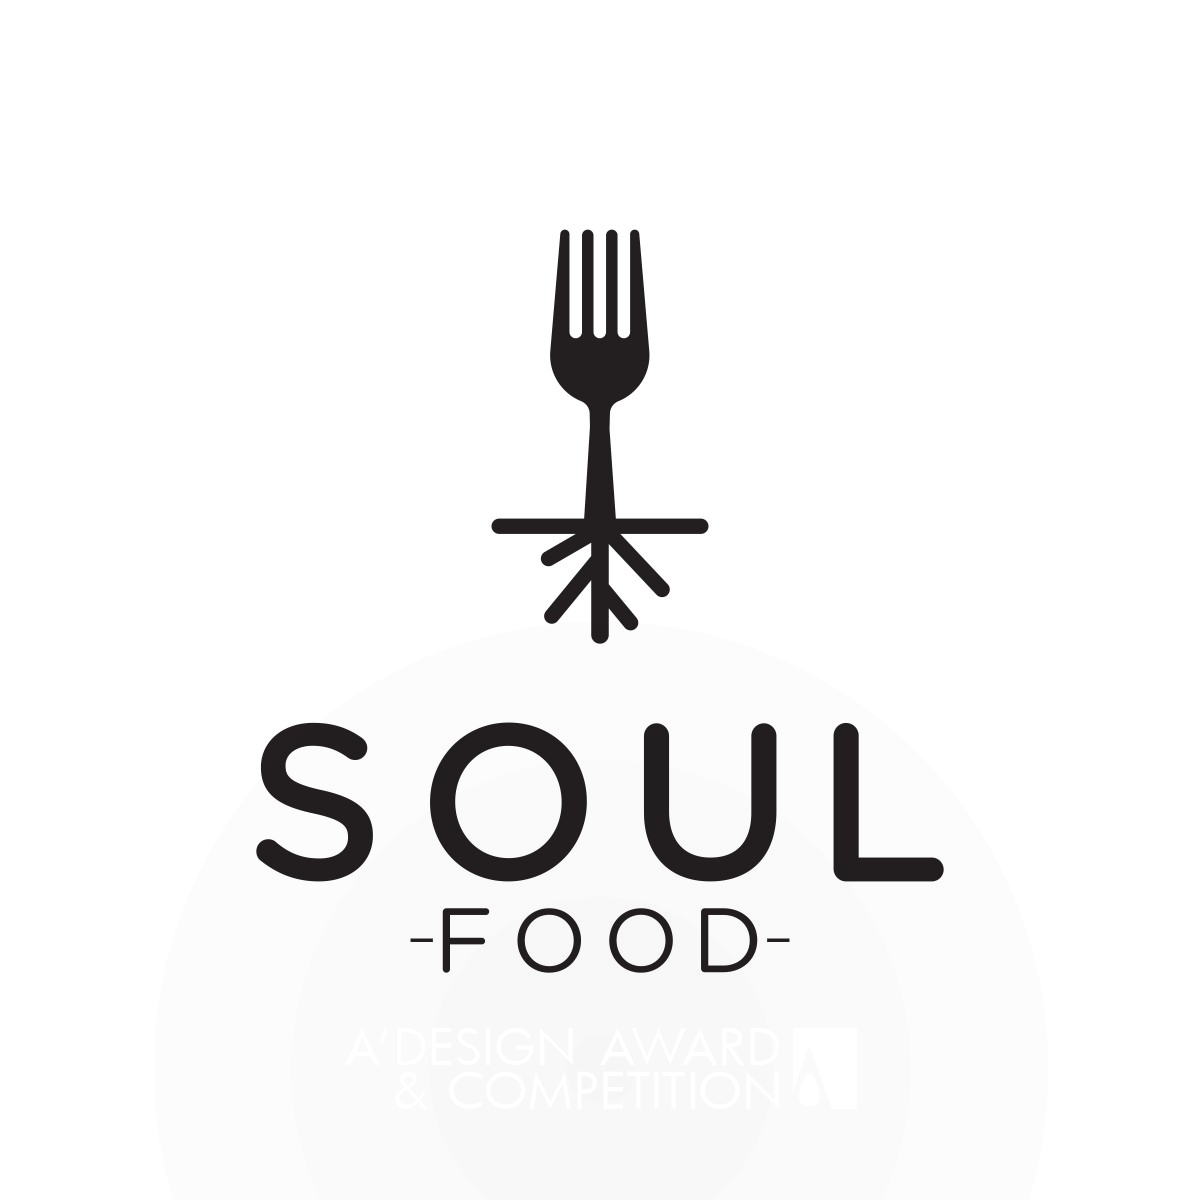 Soul Food Brand Identity